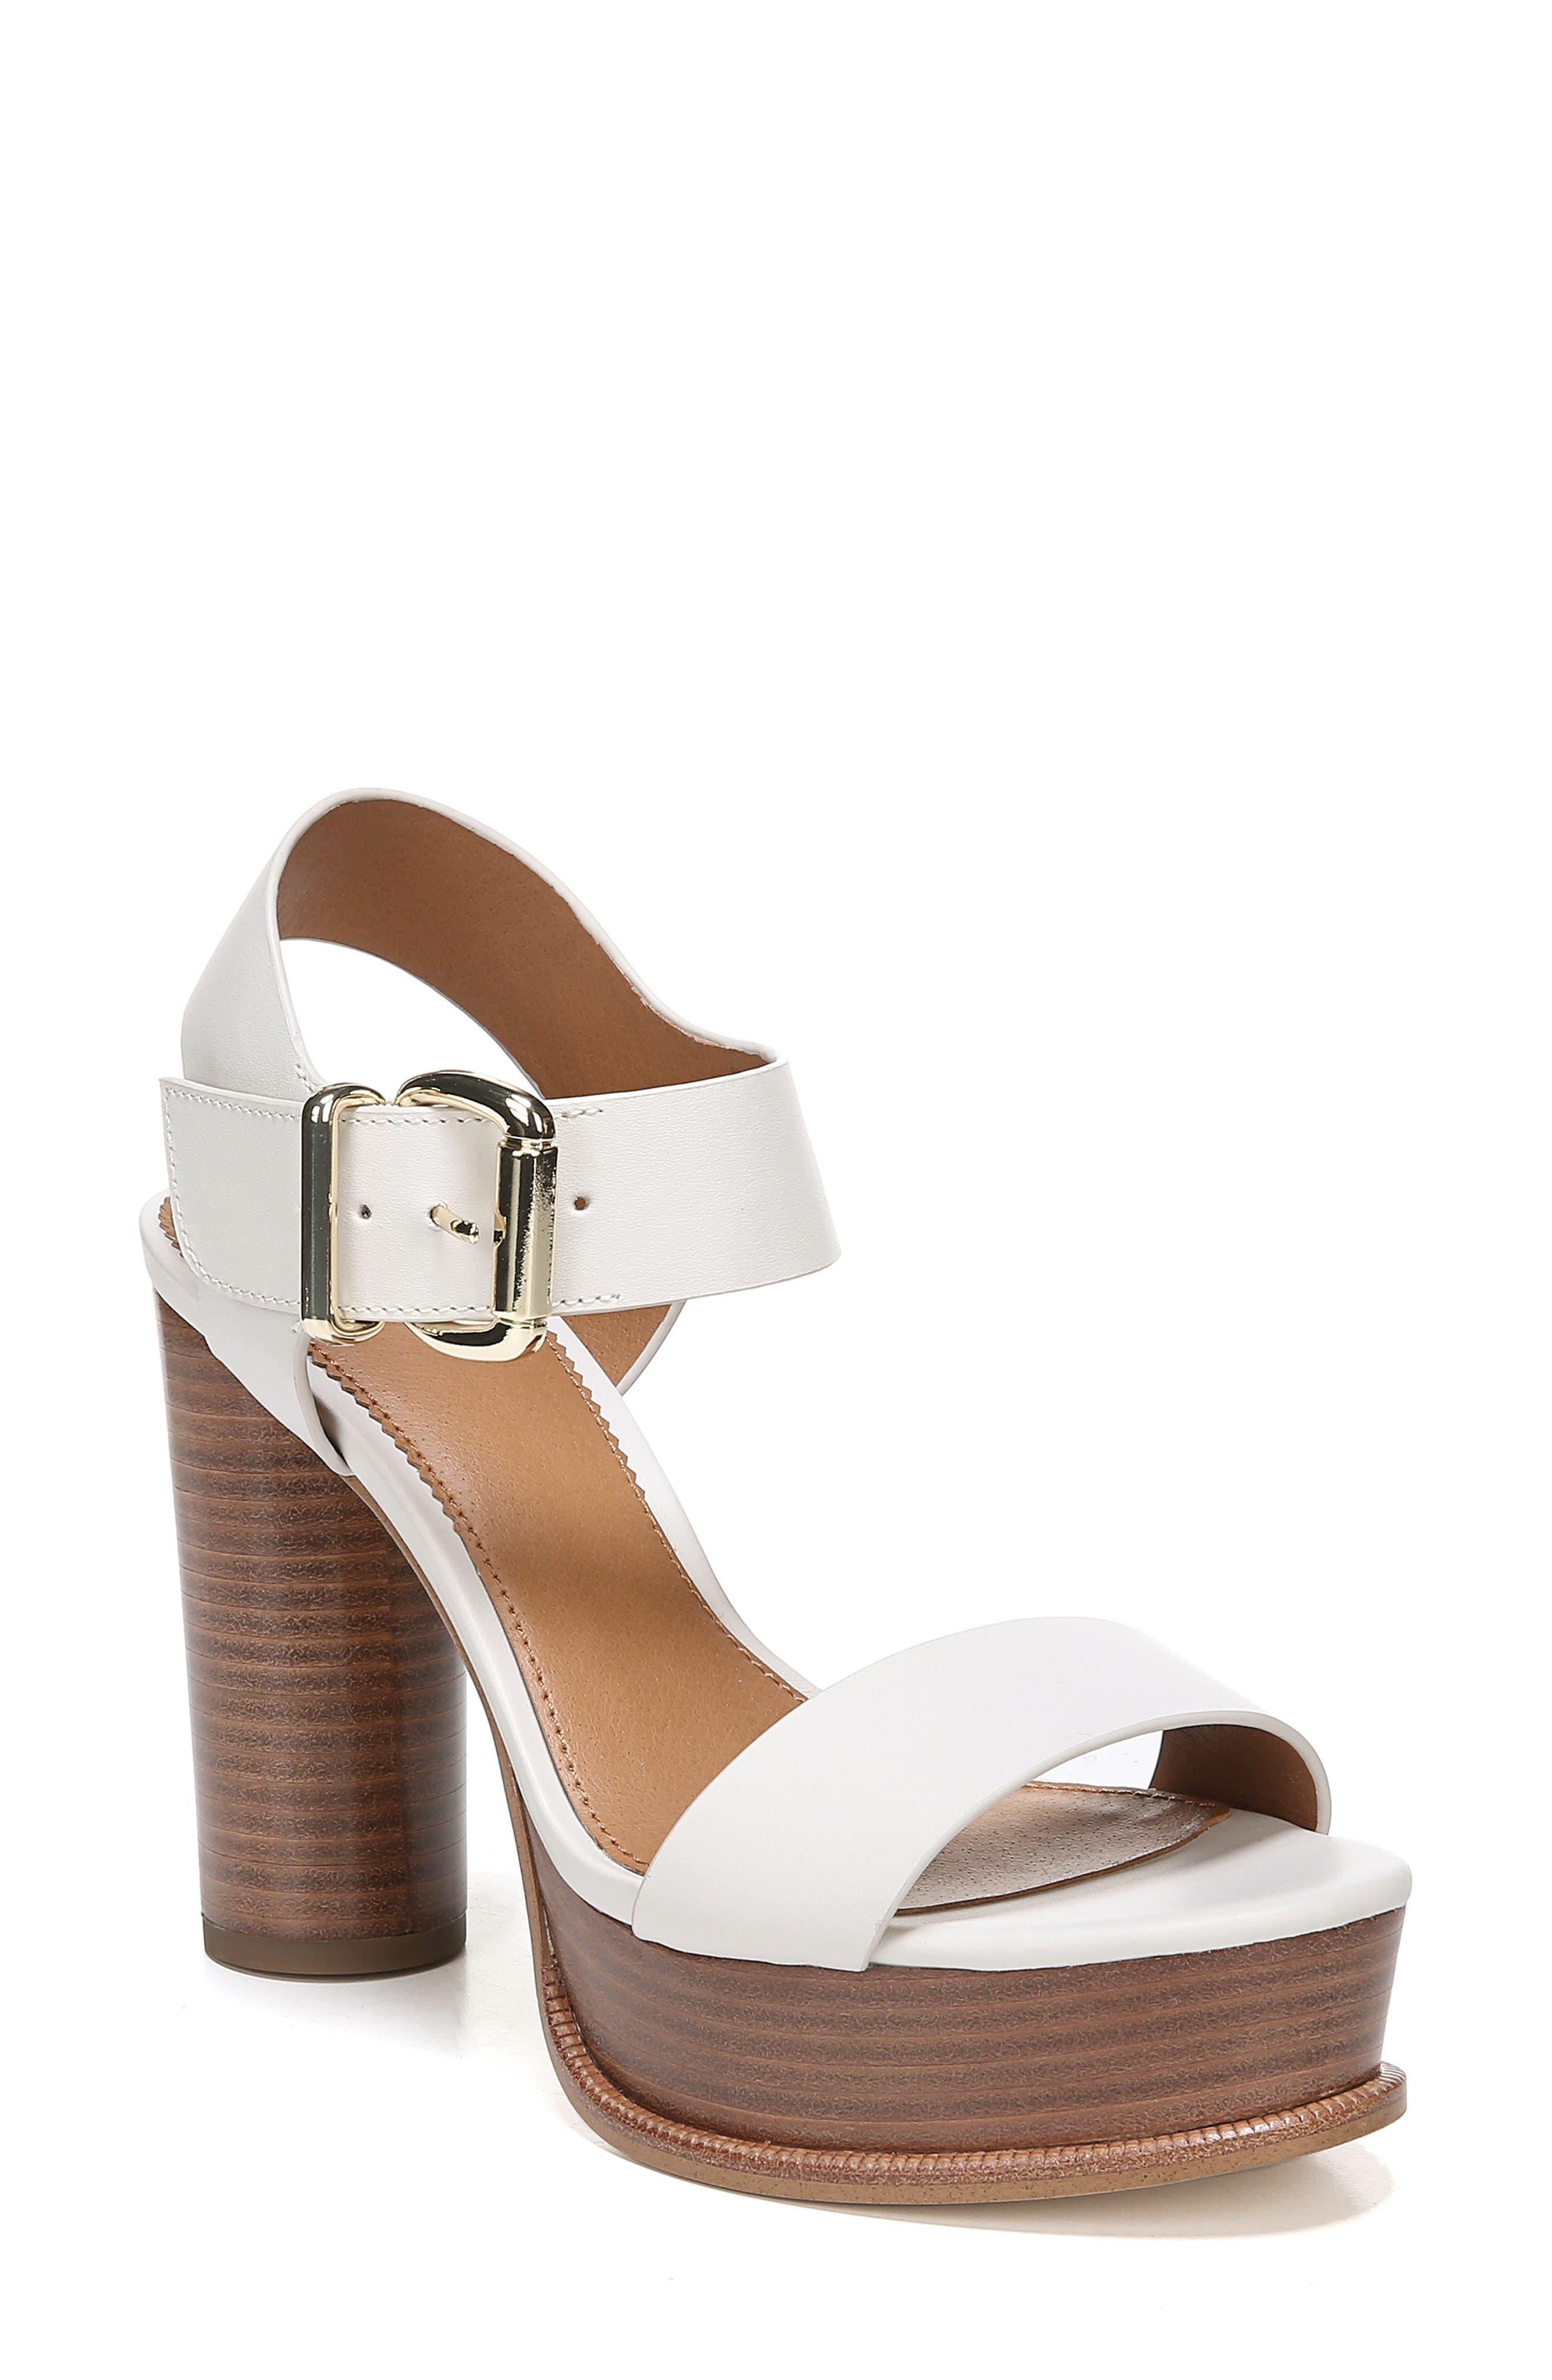 Sarto By Franco Sarto Katerina Platform Sandal- Beige